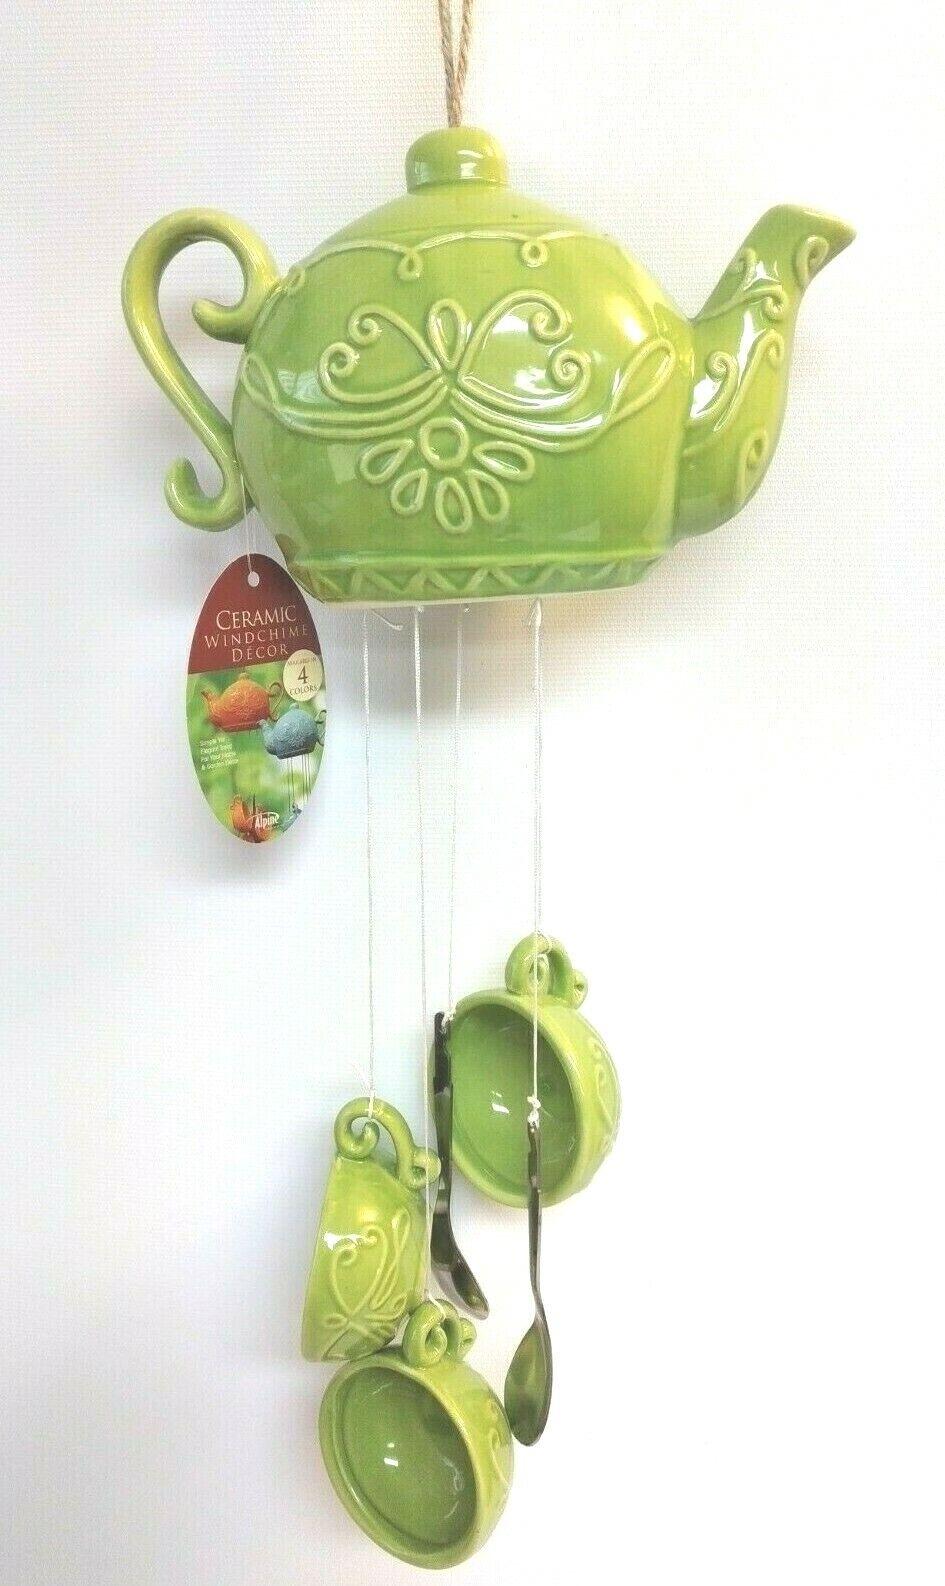 Ceramic Teapot Cup Wind Chime Indoor Outdoor Hanging Decoration Green Alpine